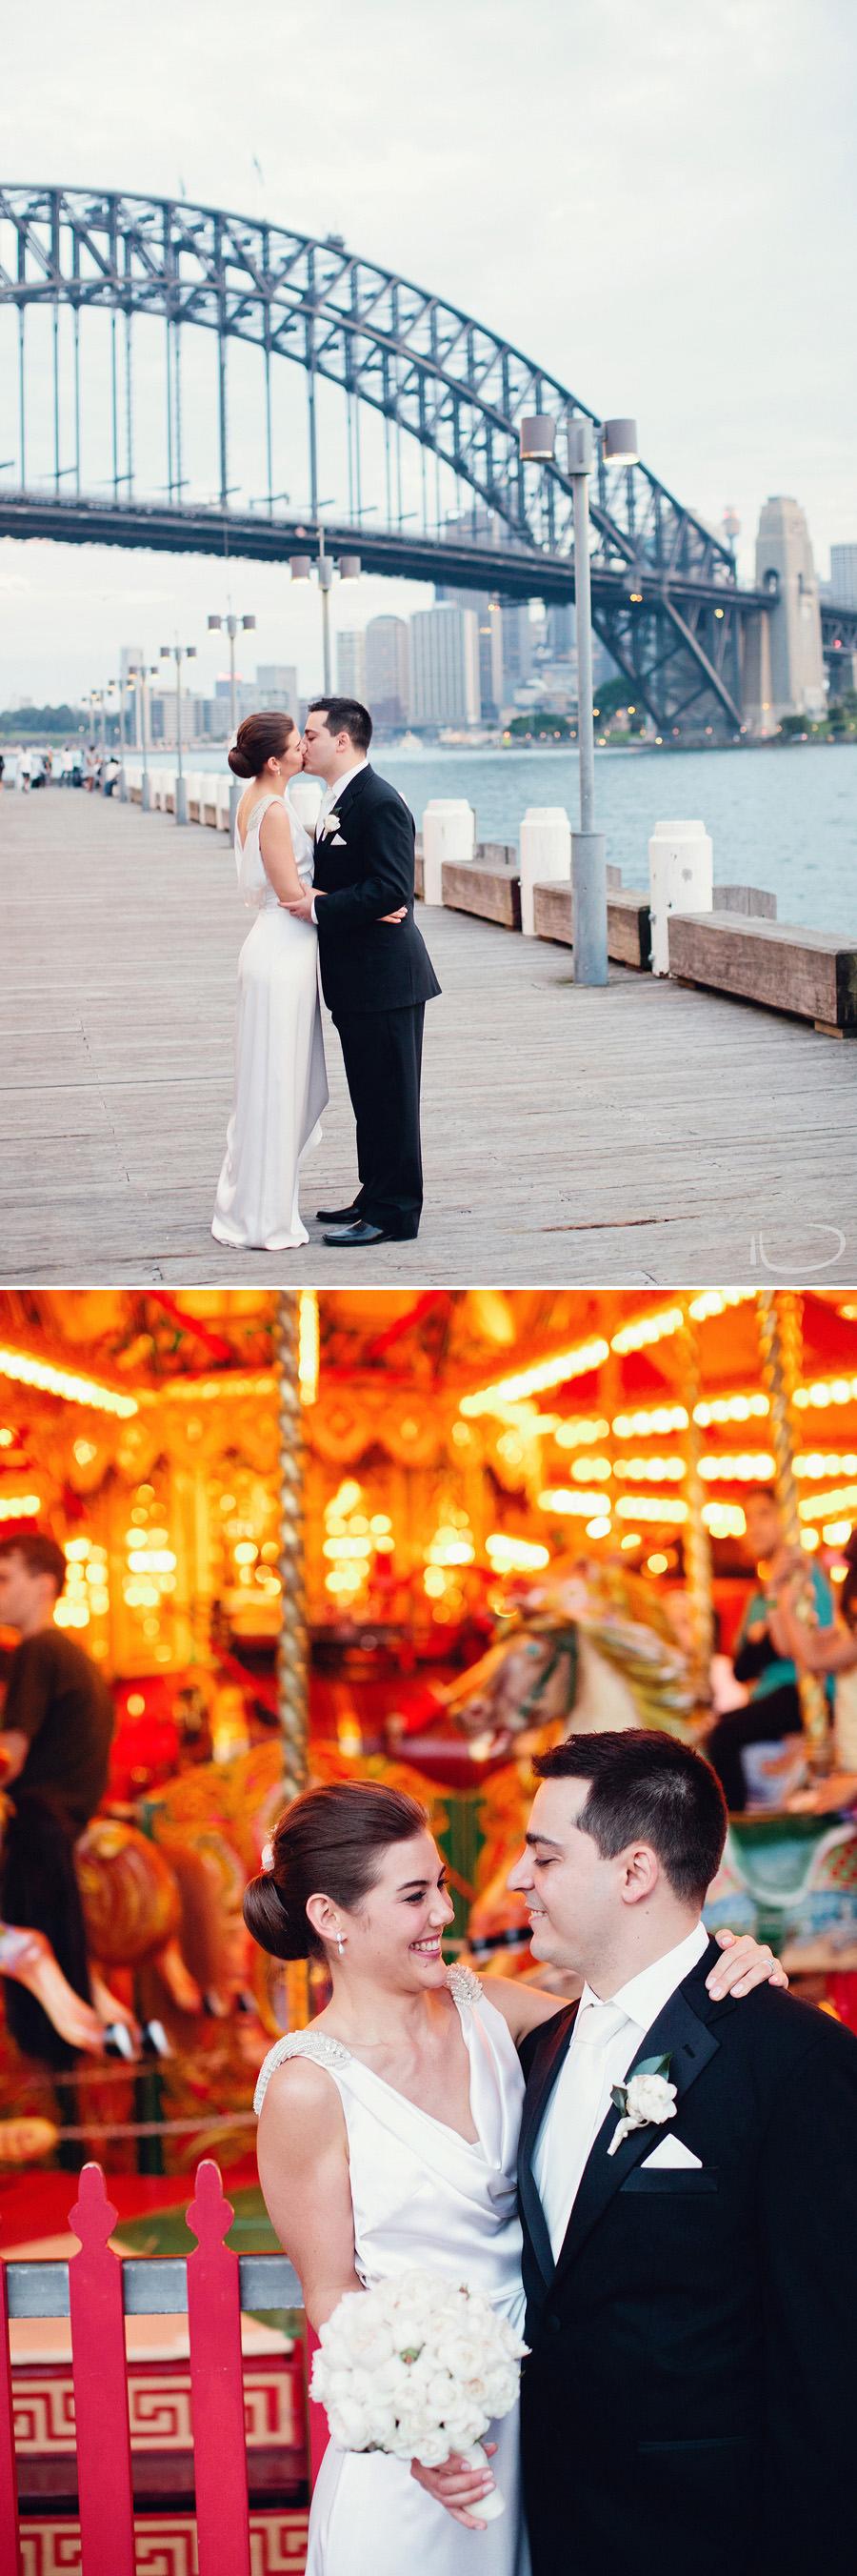 Luna Park Wedding Photographers: Bride & Groom